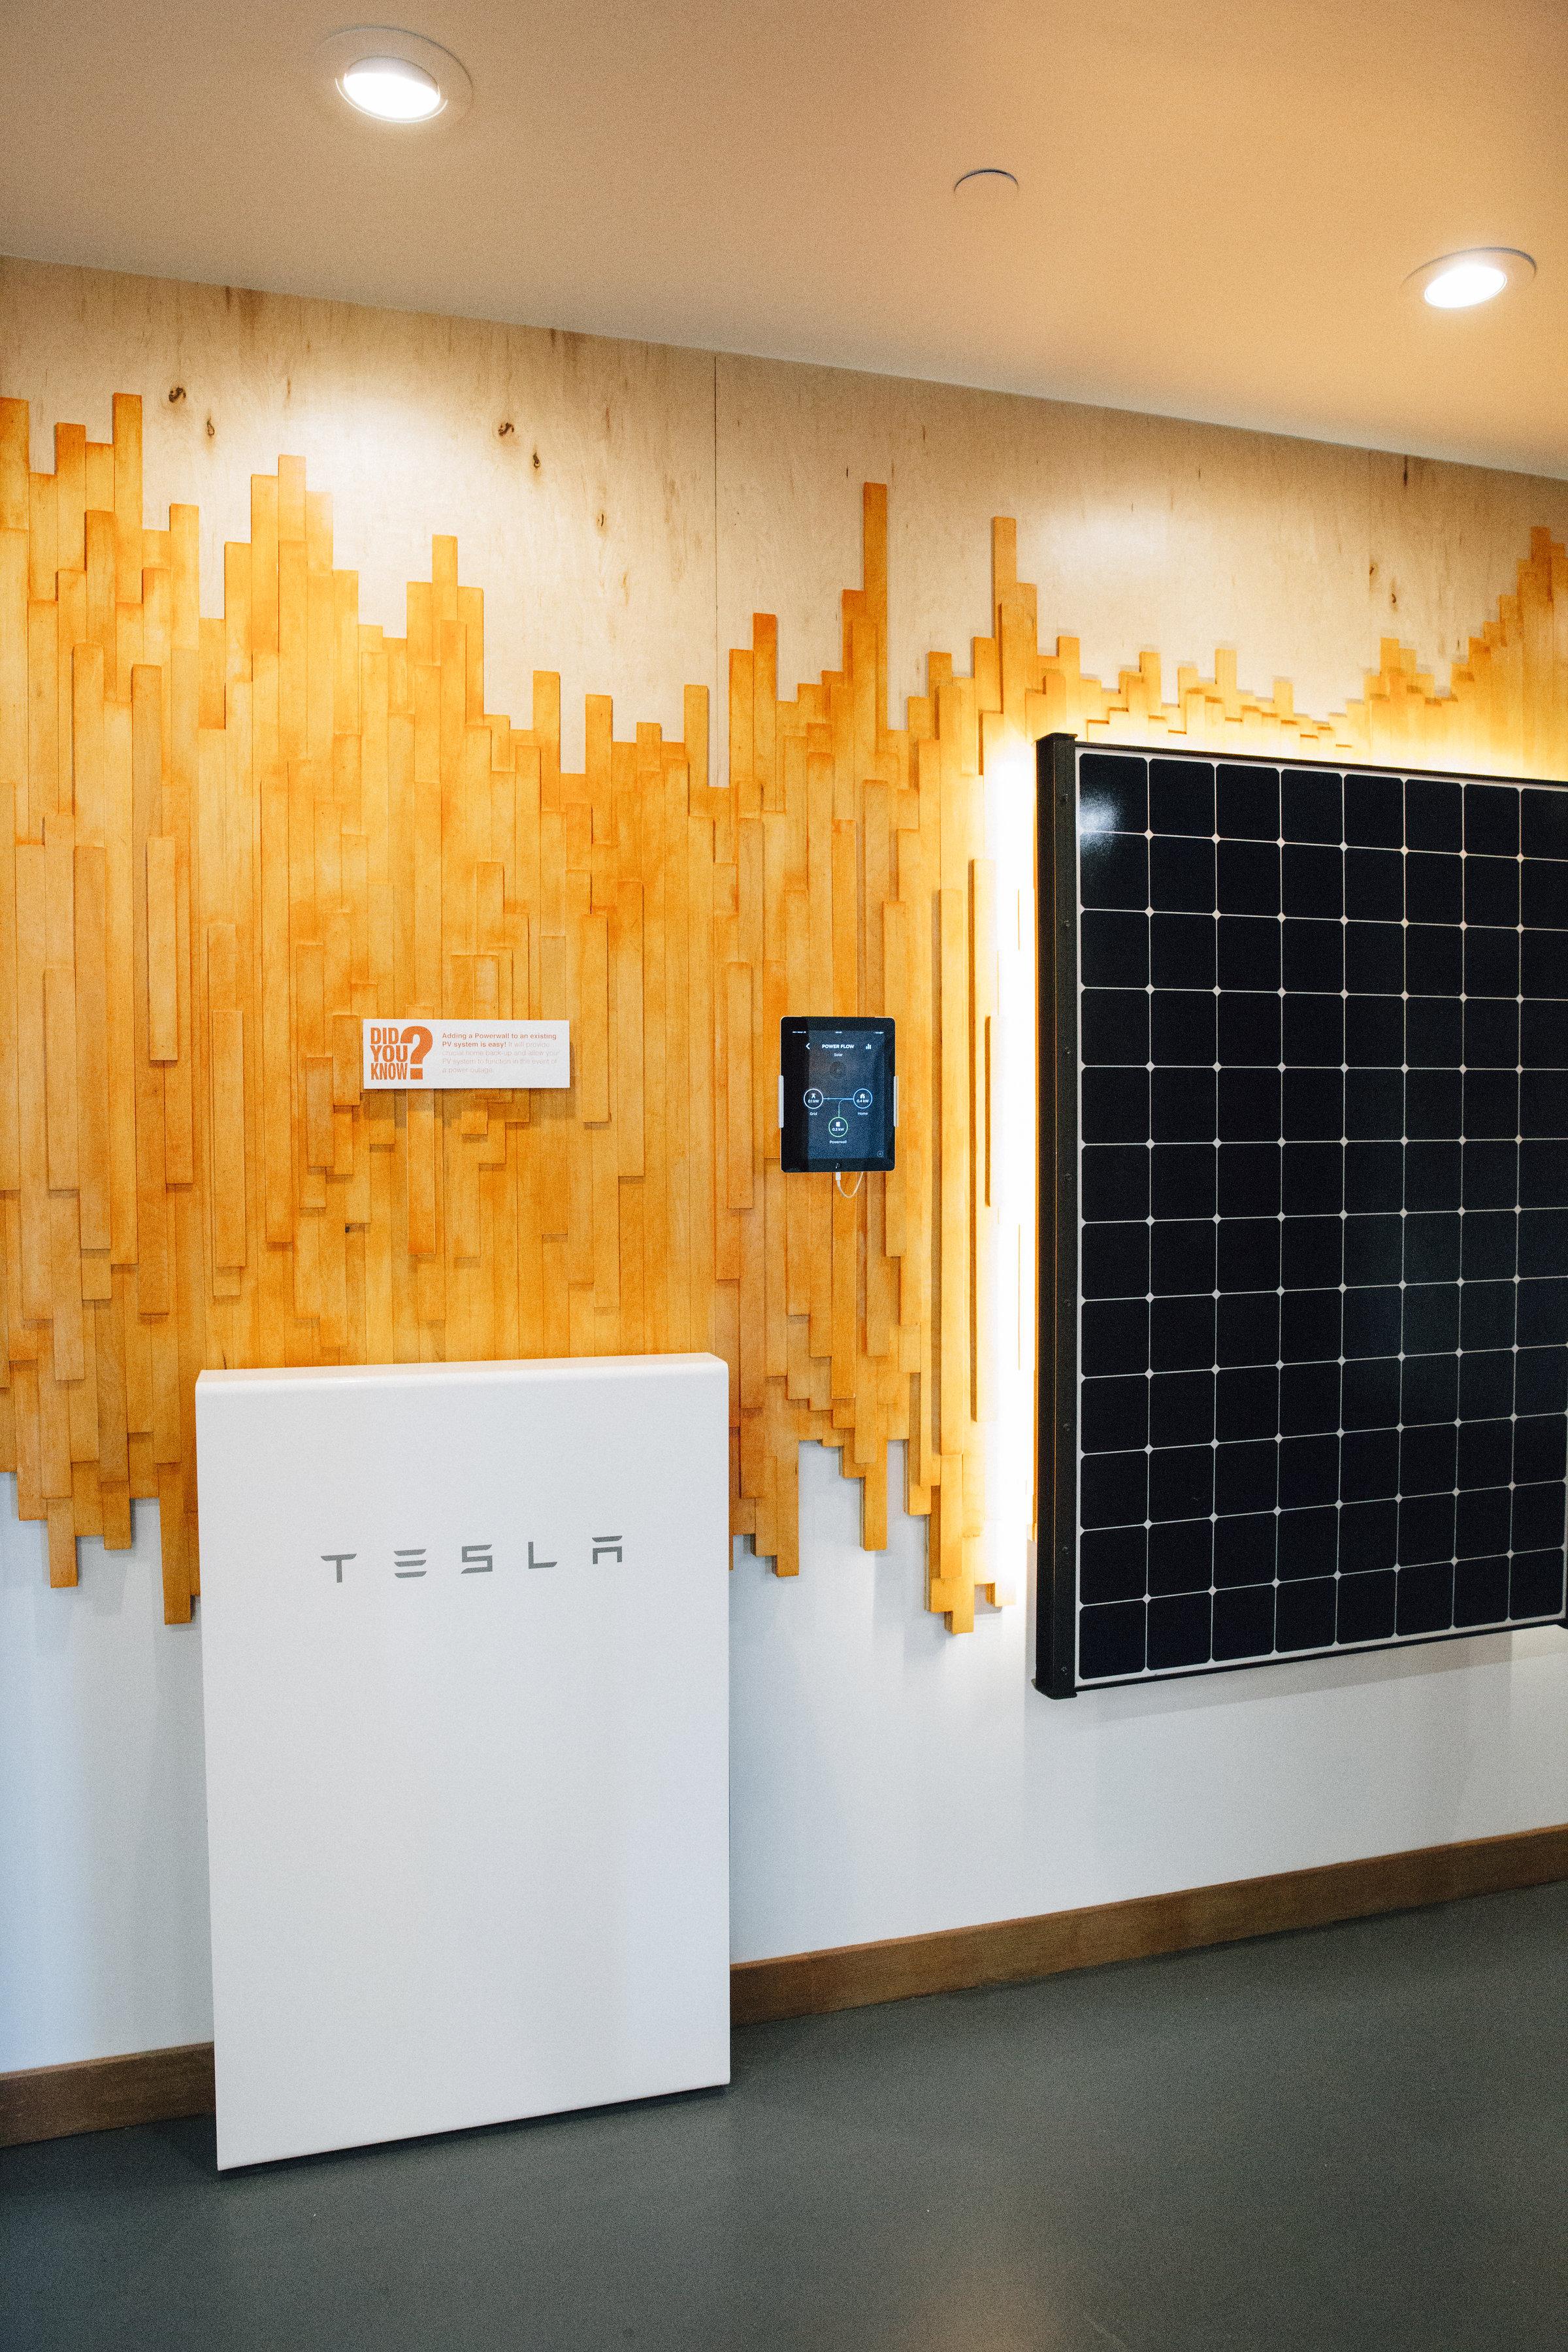 RevoluSun Smart Home Innovation Center Showroom - Tesla Powerwall + PV Panel